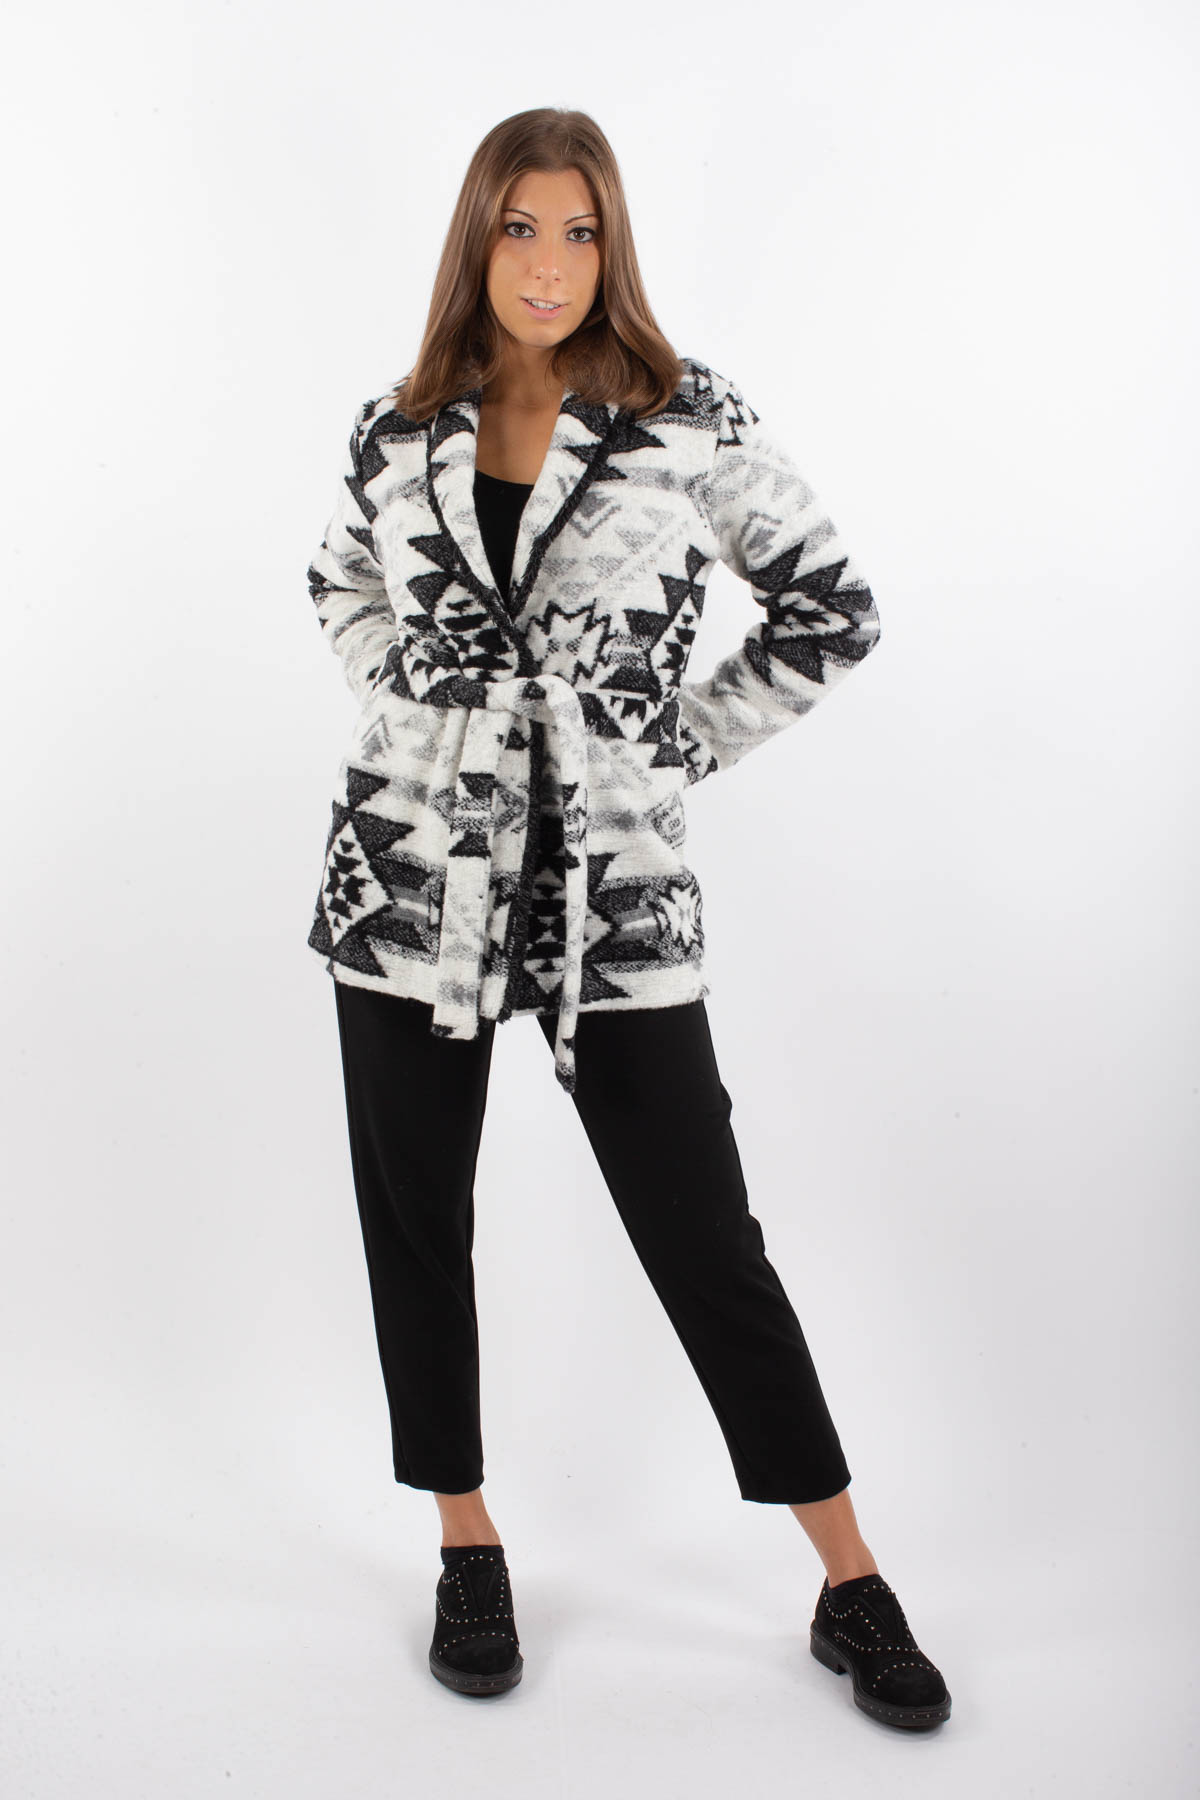 GIACCA IN MISTO LANA CON CINTURA   for woman - CREAM - Paquito Pronto Moda Shop Online